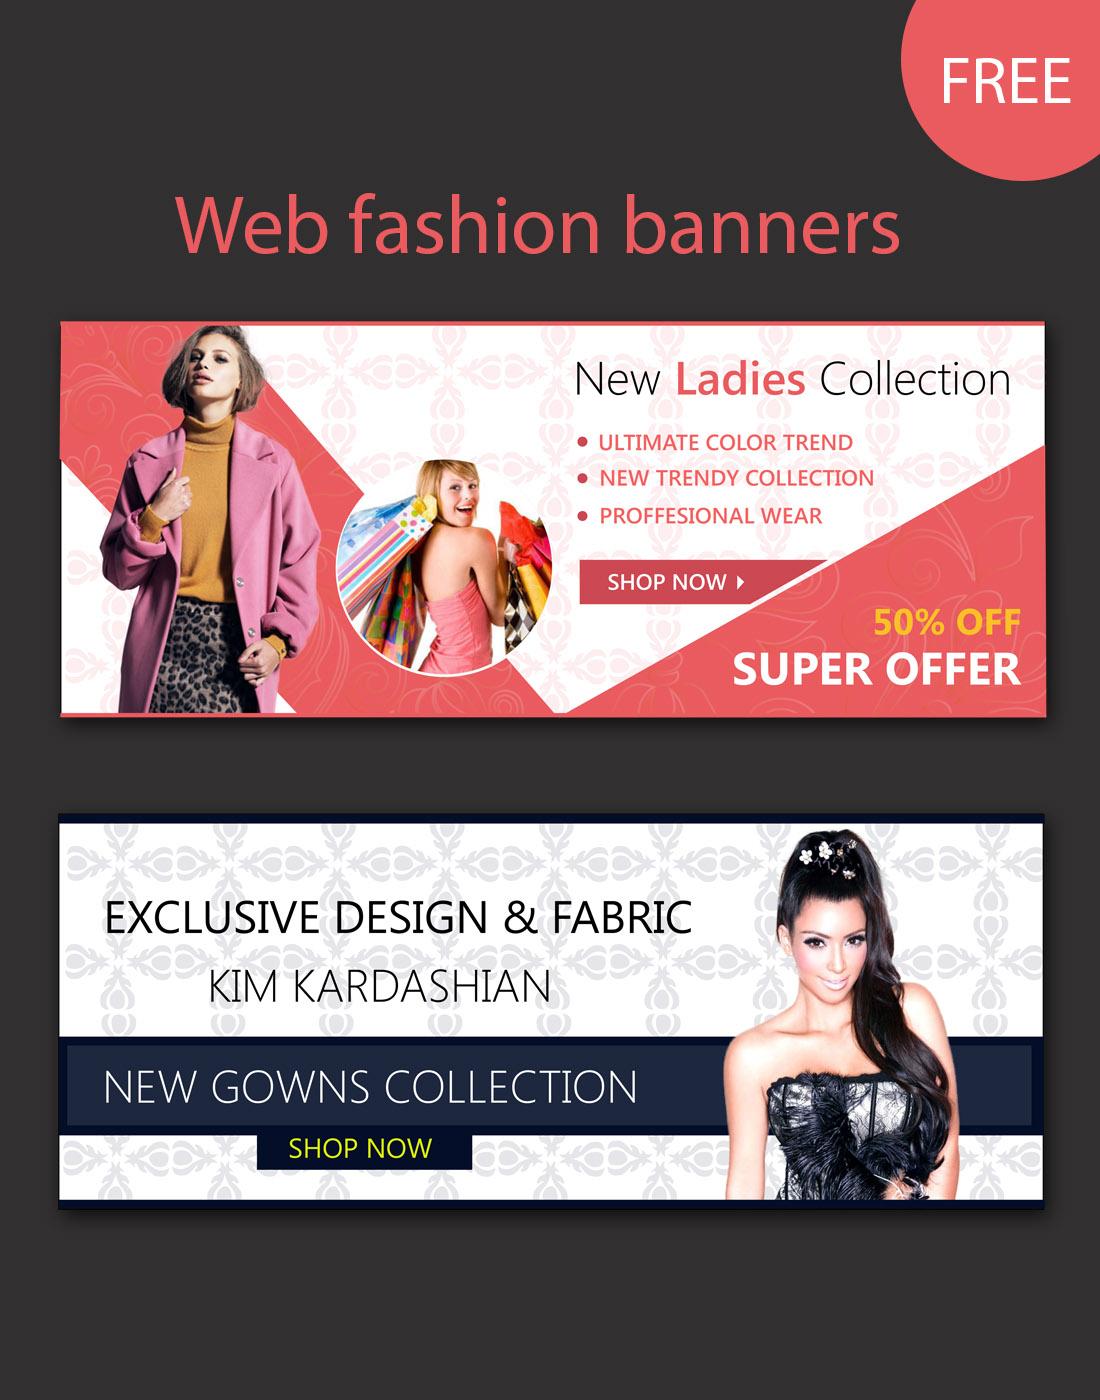 kim kardashian website banners